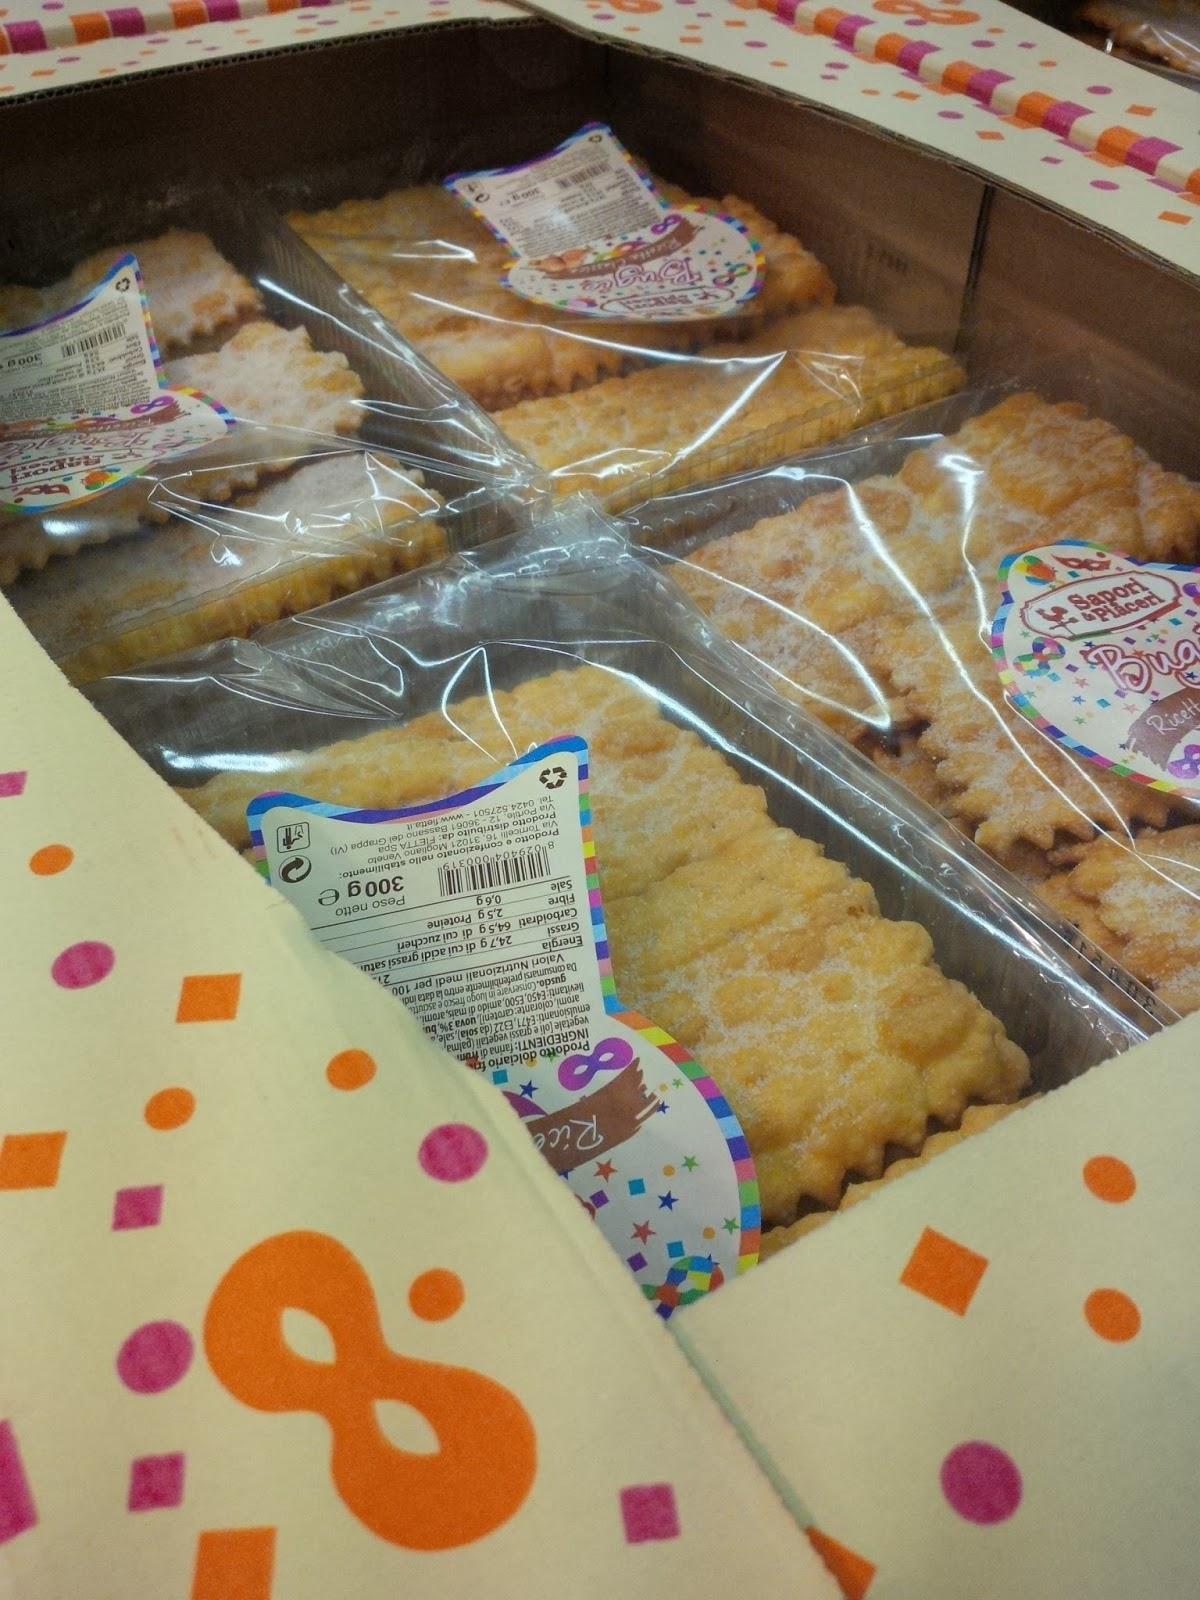 Packs with crostolli in an Italian supermarket, Vicenza, Veneto, Italy